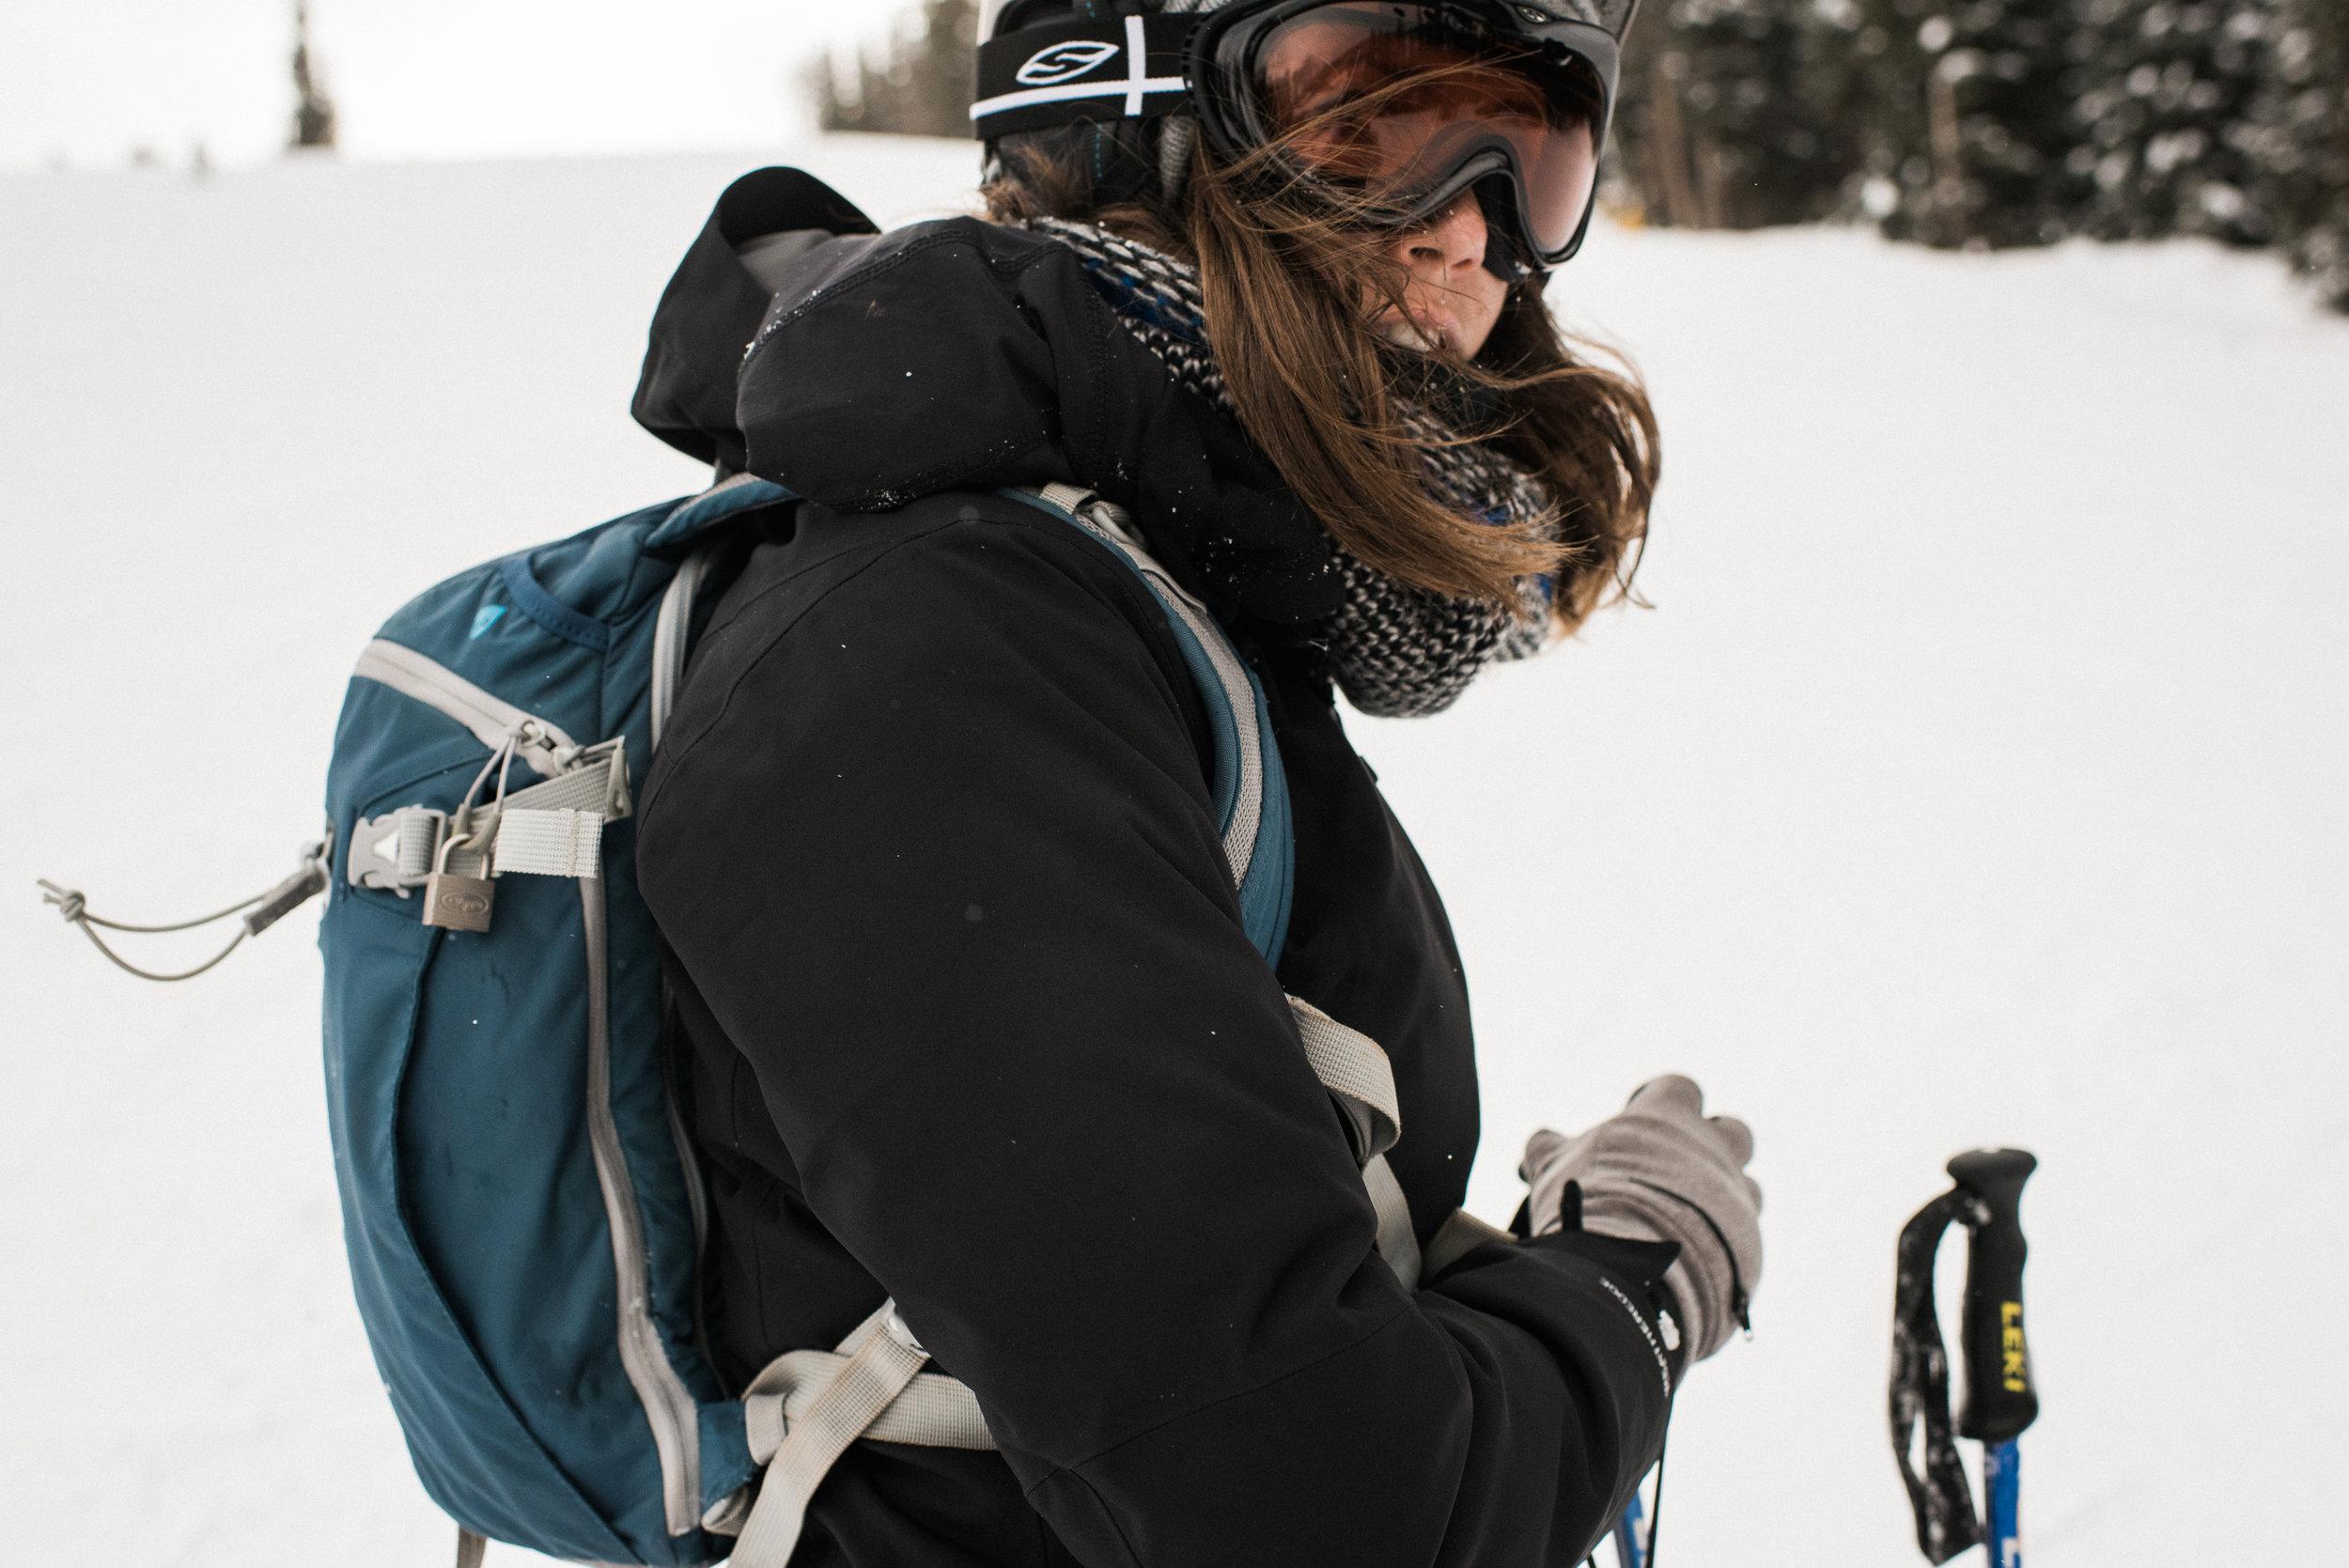 TaraShupe_Outdoor_Photographer_Loweprobags_Colorado_Copper_Mountains_Ski_15.jpg